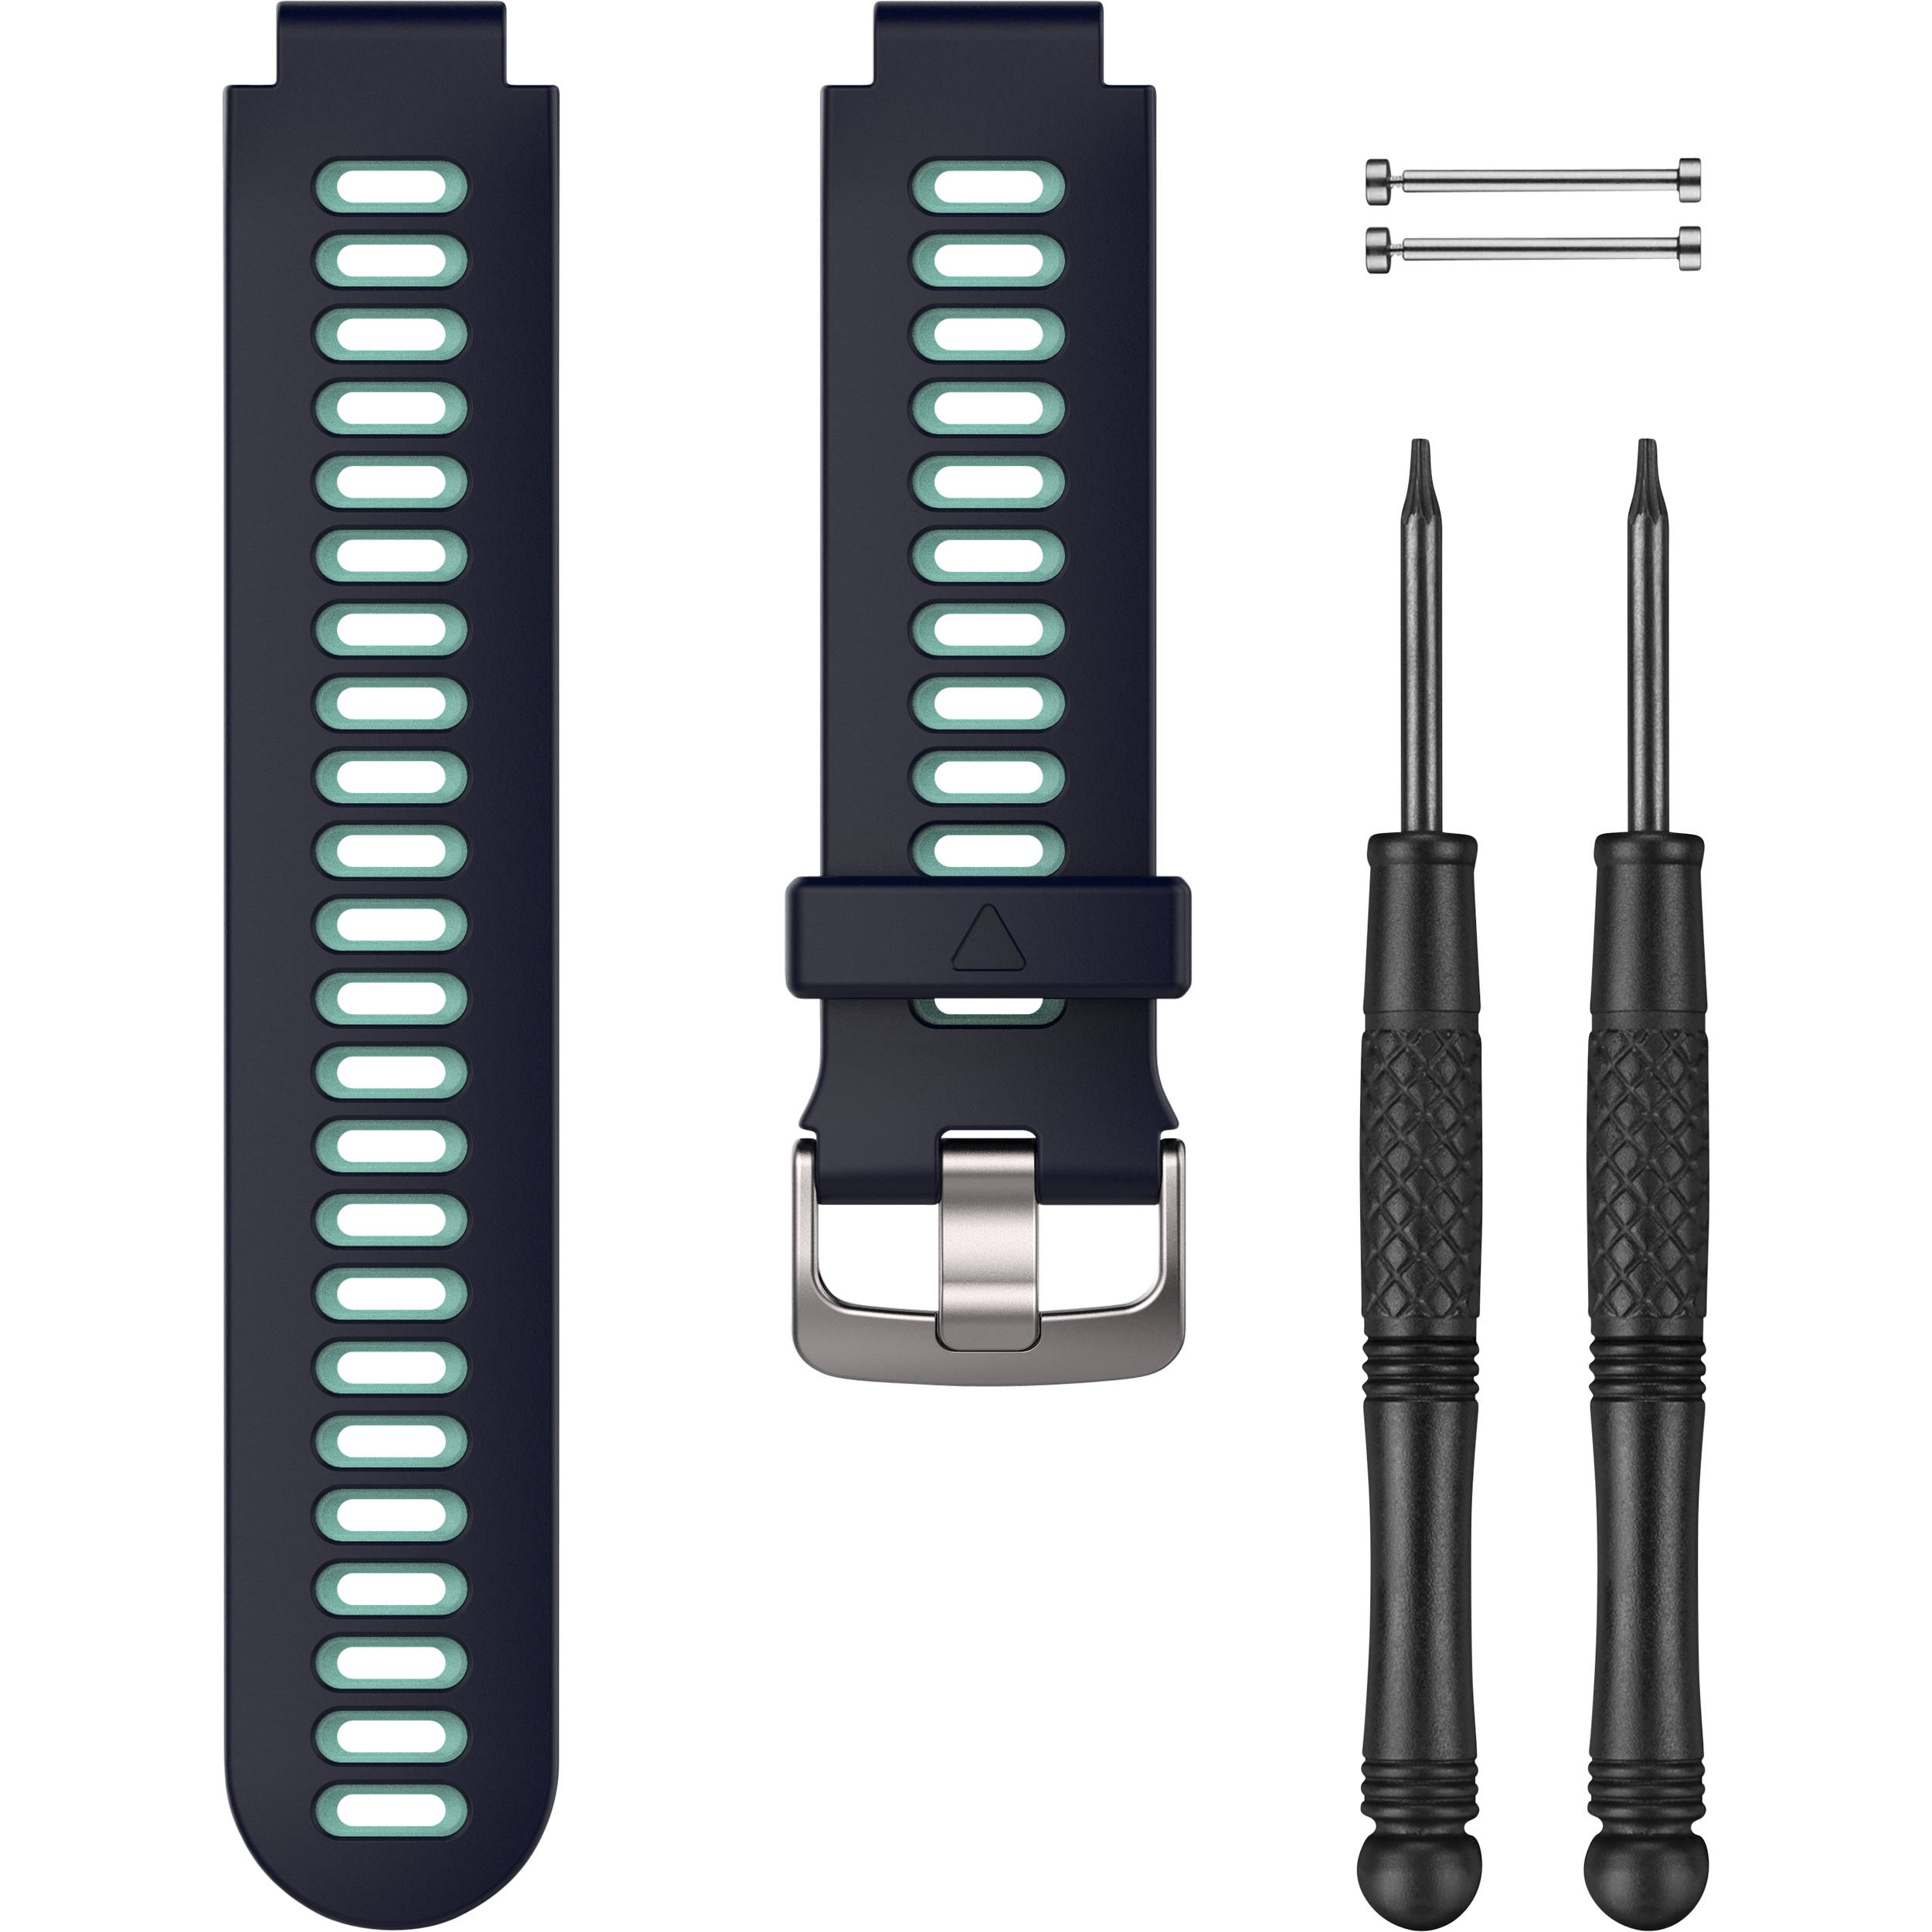 Garmin Replacement Watch Strap Band | For Forerunner 230 / 235 / 630 / 735XT | Midnight Blue